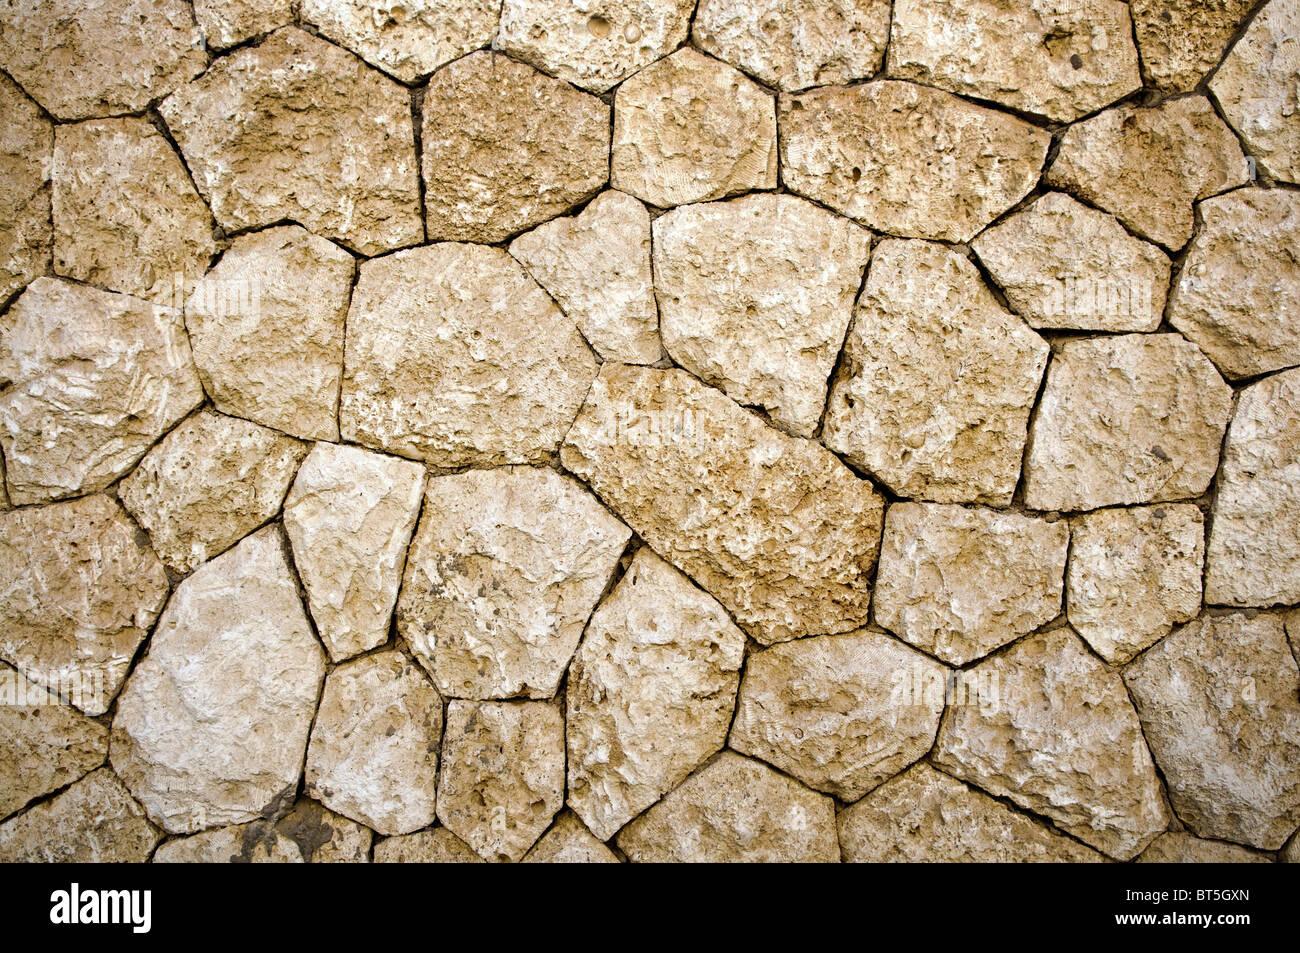 Muro de piedra erosionados o textura de fondo Imagen De Stock